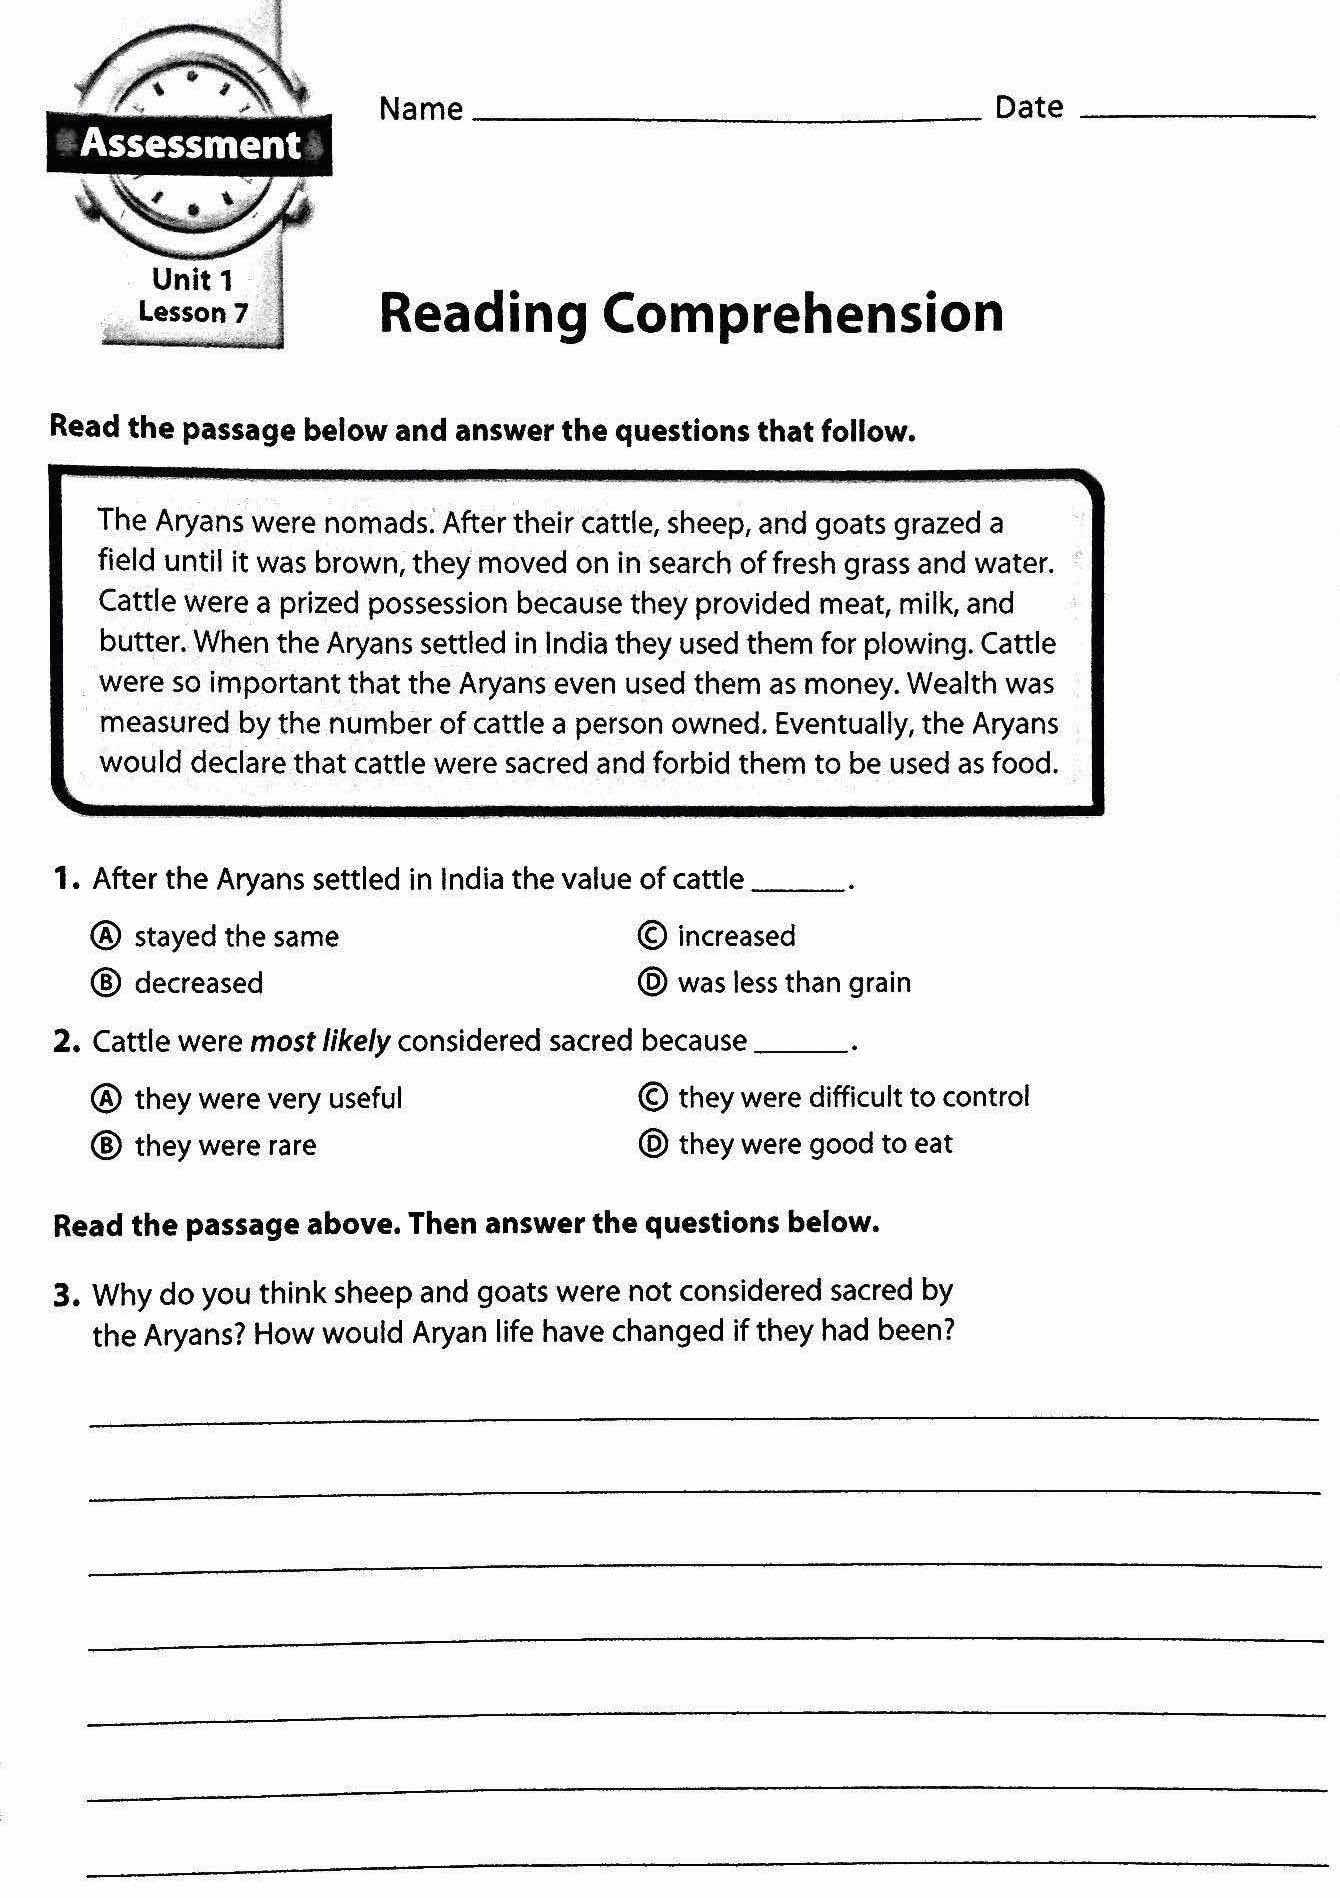 Reading Comprehension – Aryans  Mr Proehl's Social Studies